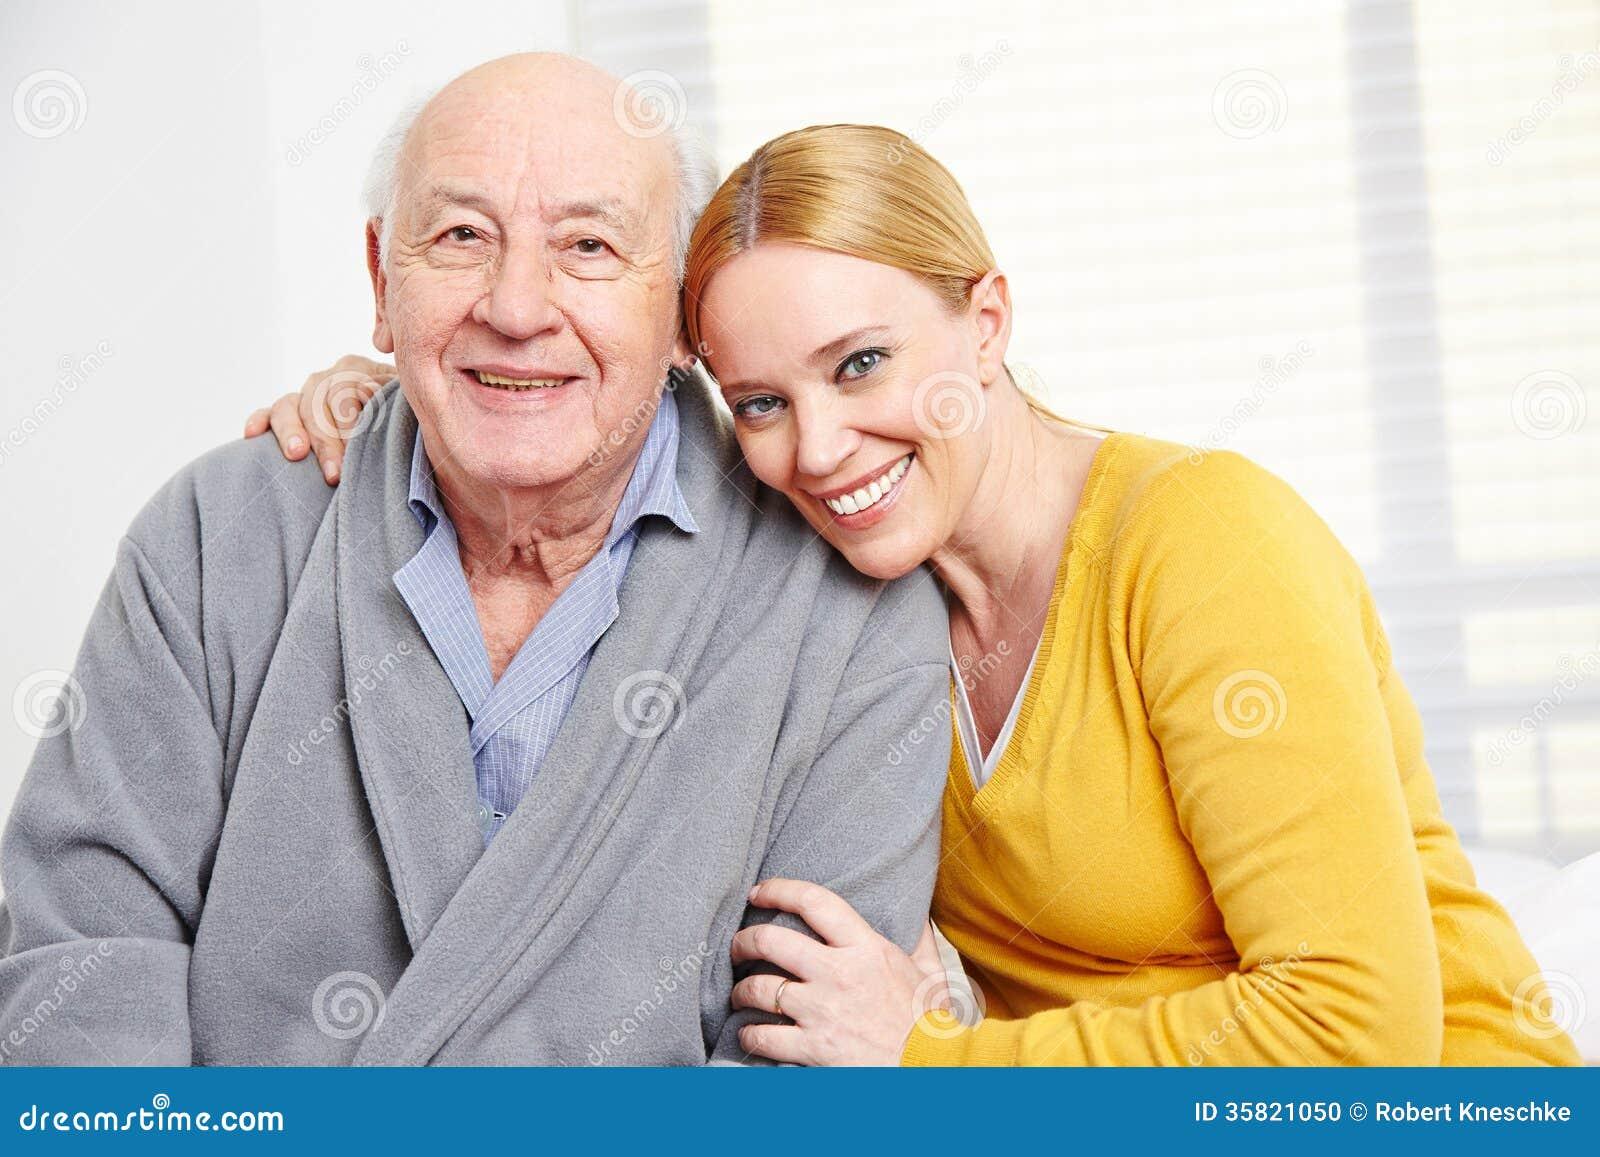 family caregi alzheimers effects - 800×533